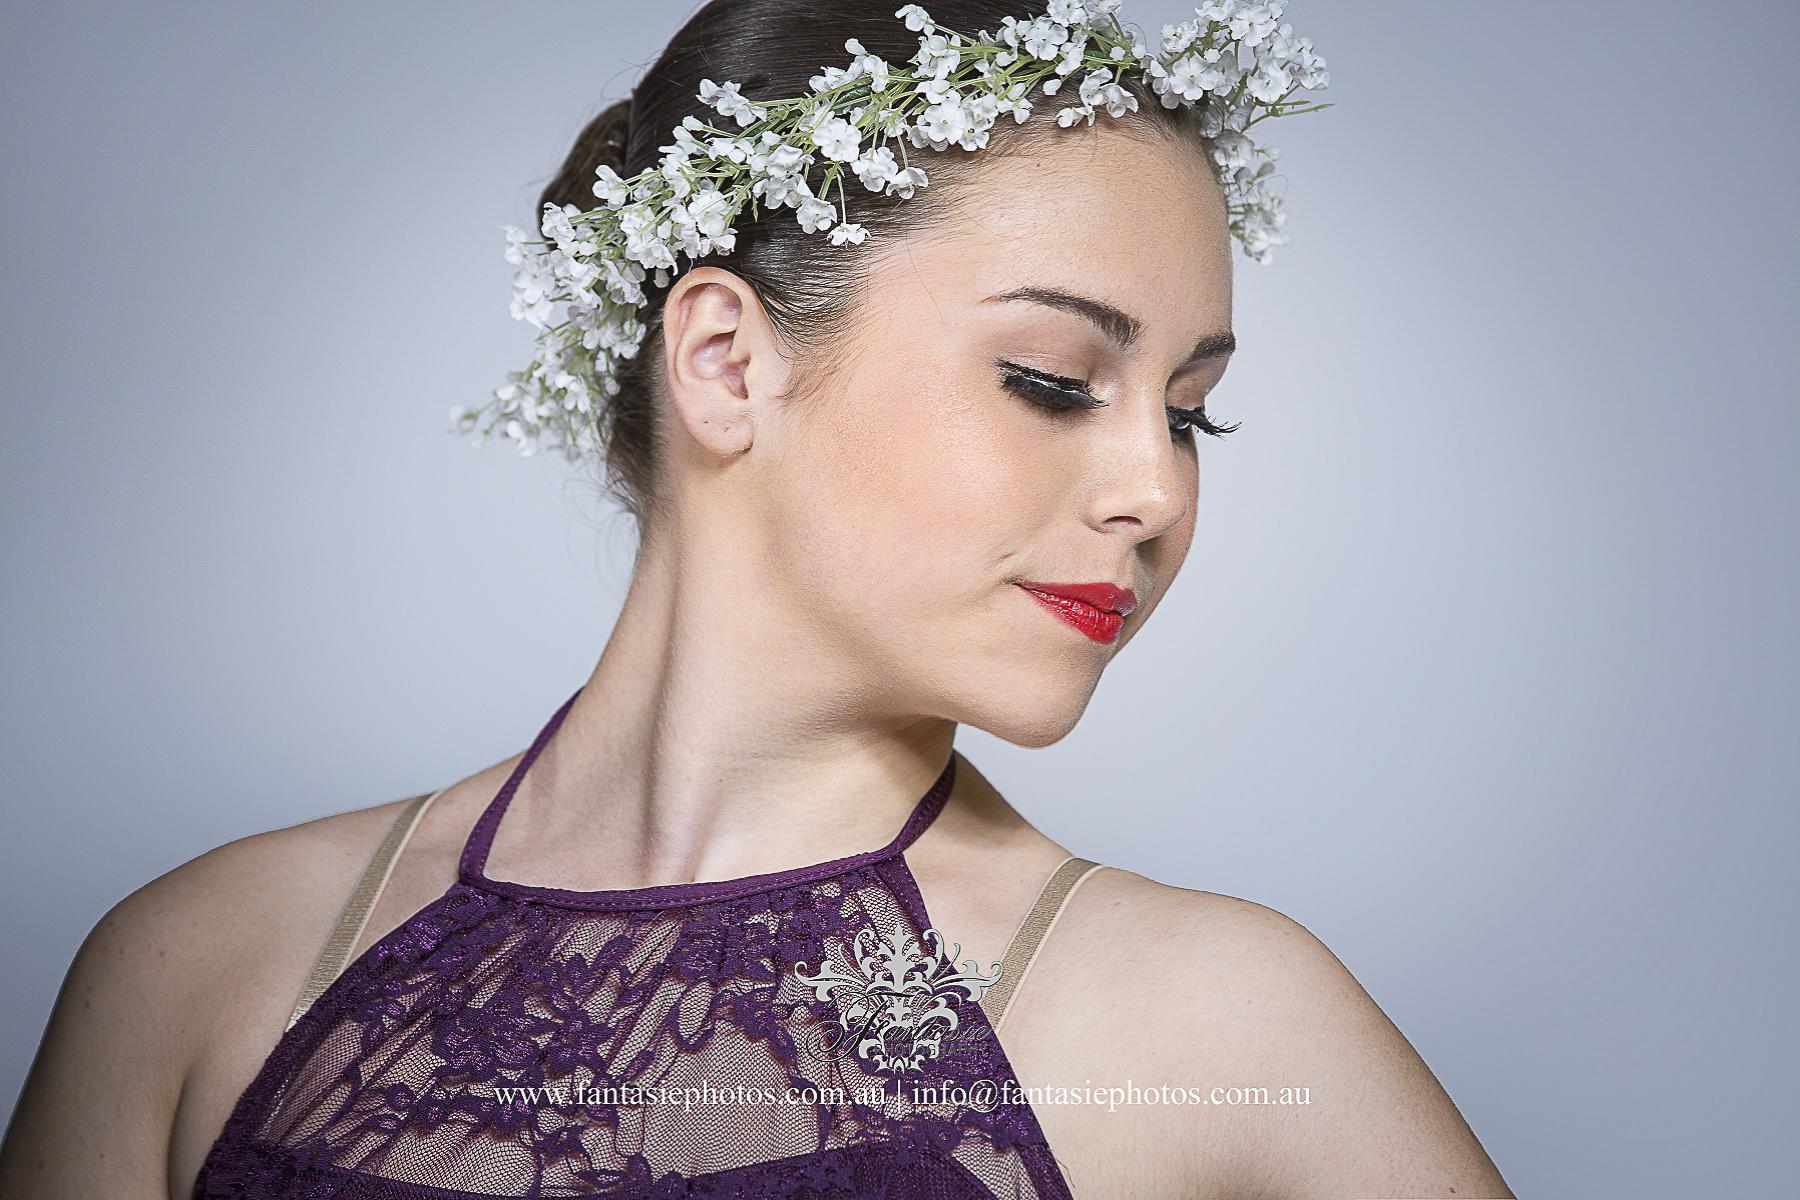 Portrait Dance Photography | Fantasie Photography